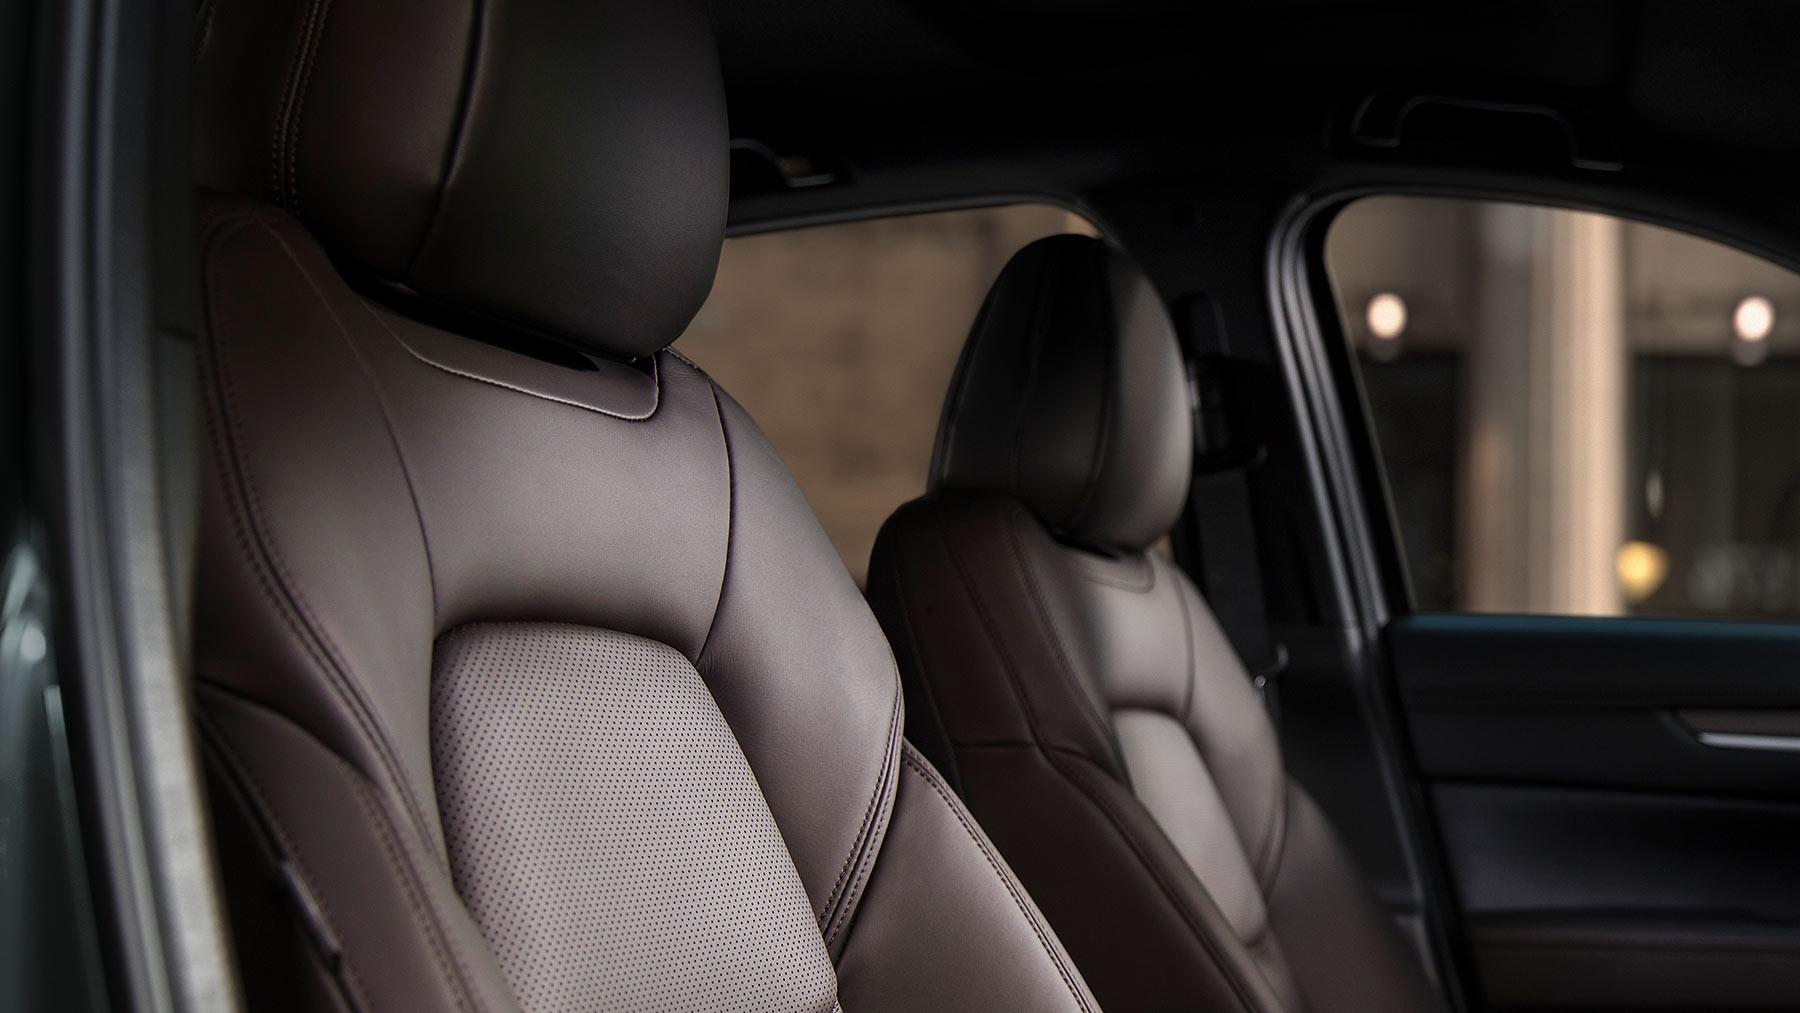 Seating in the Mazda CX-5 Diesel